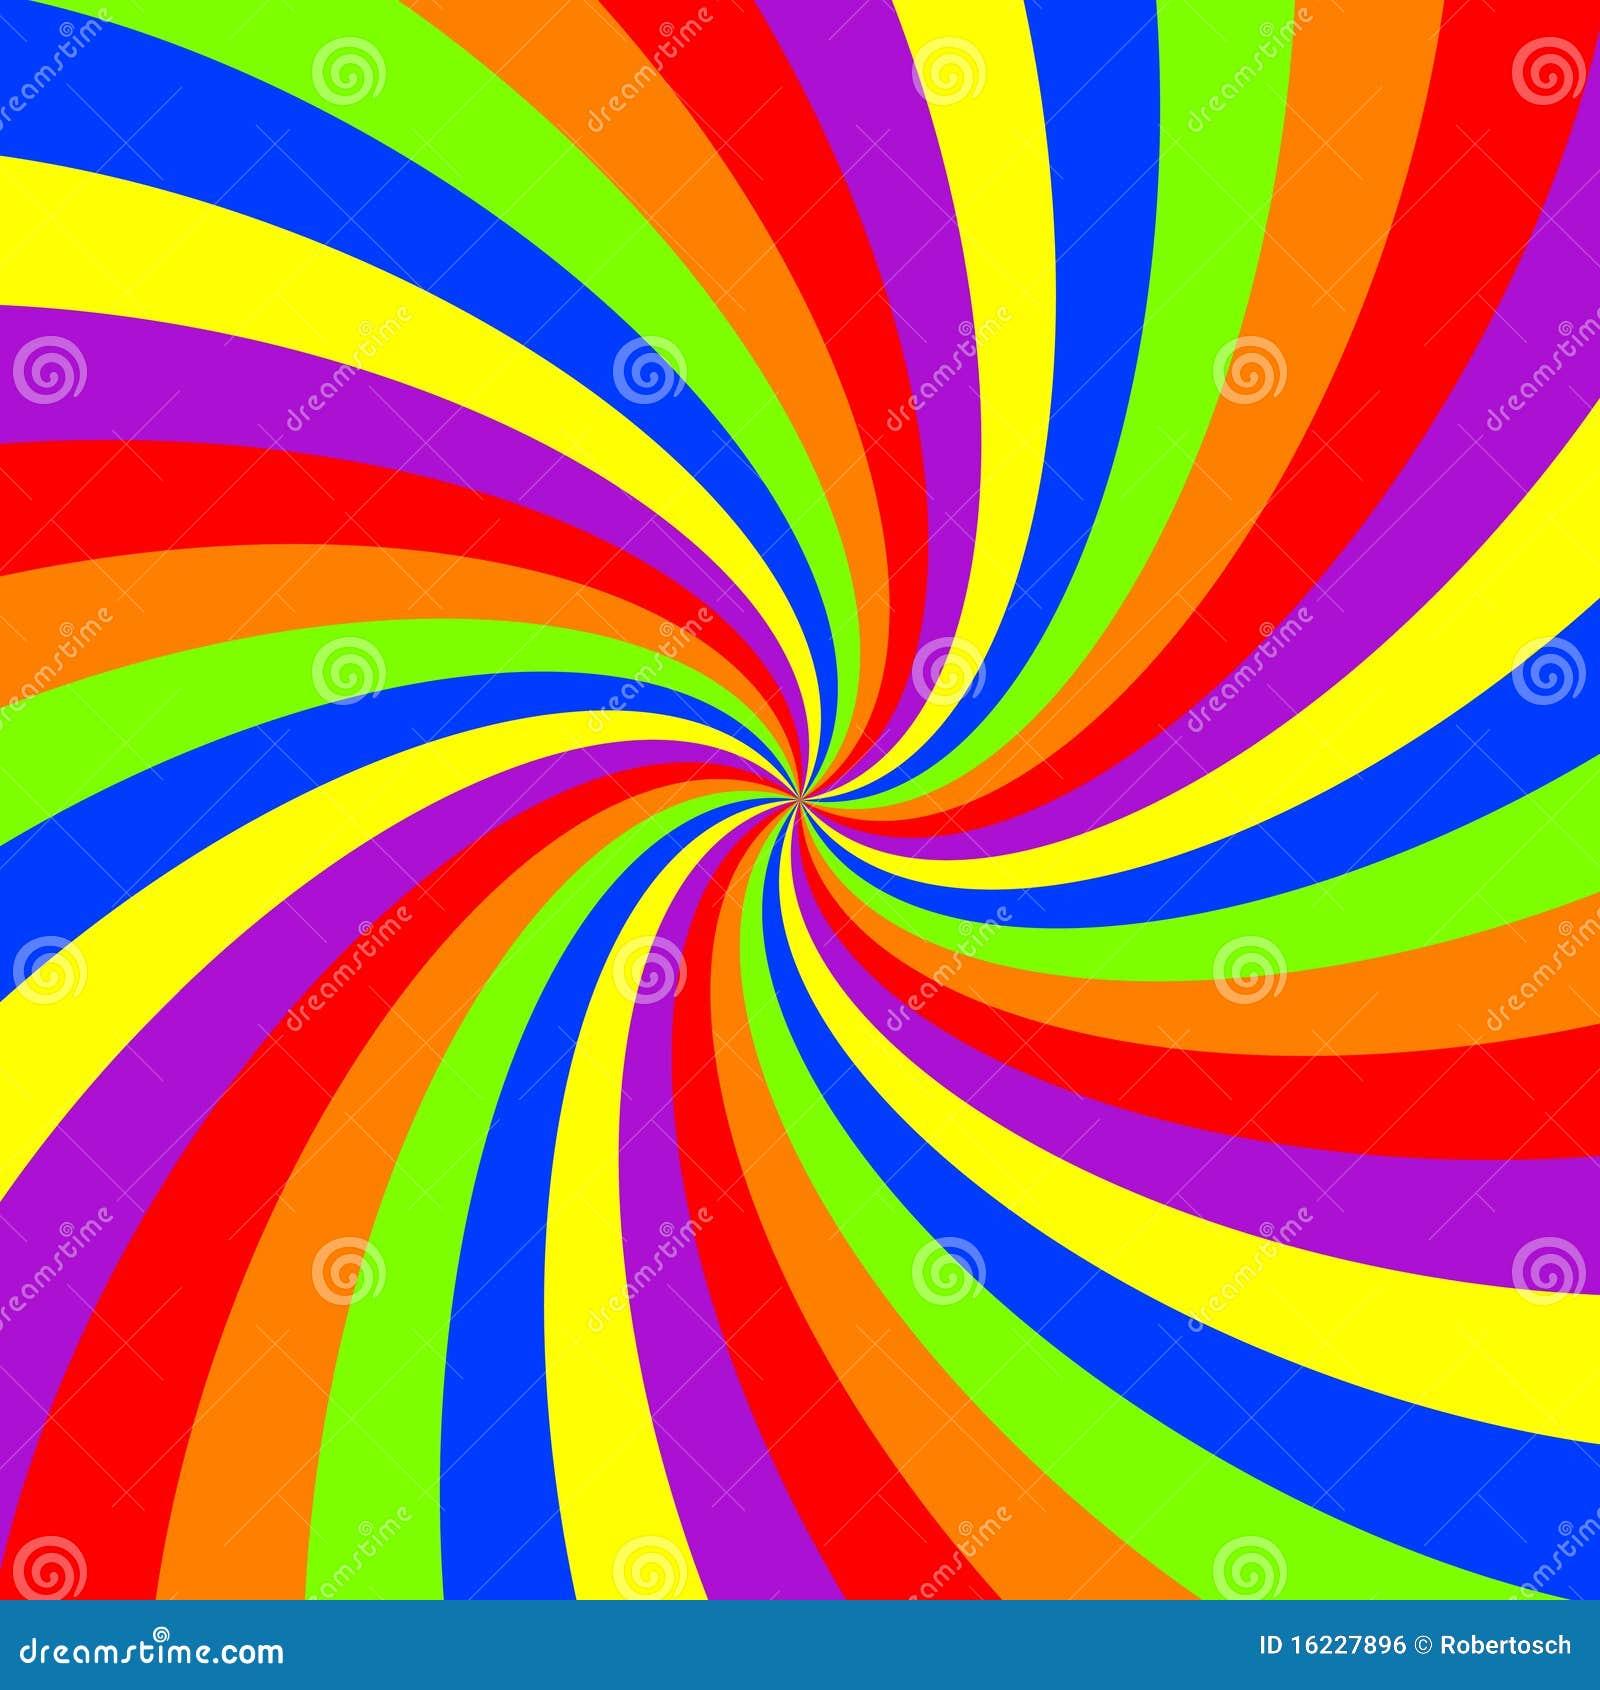 Rainbow swirl pattern